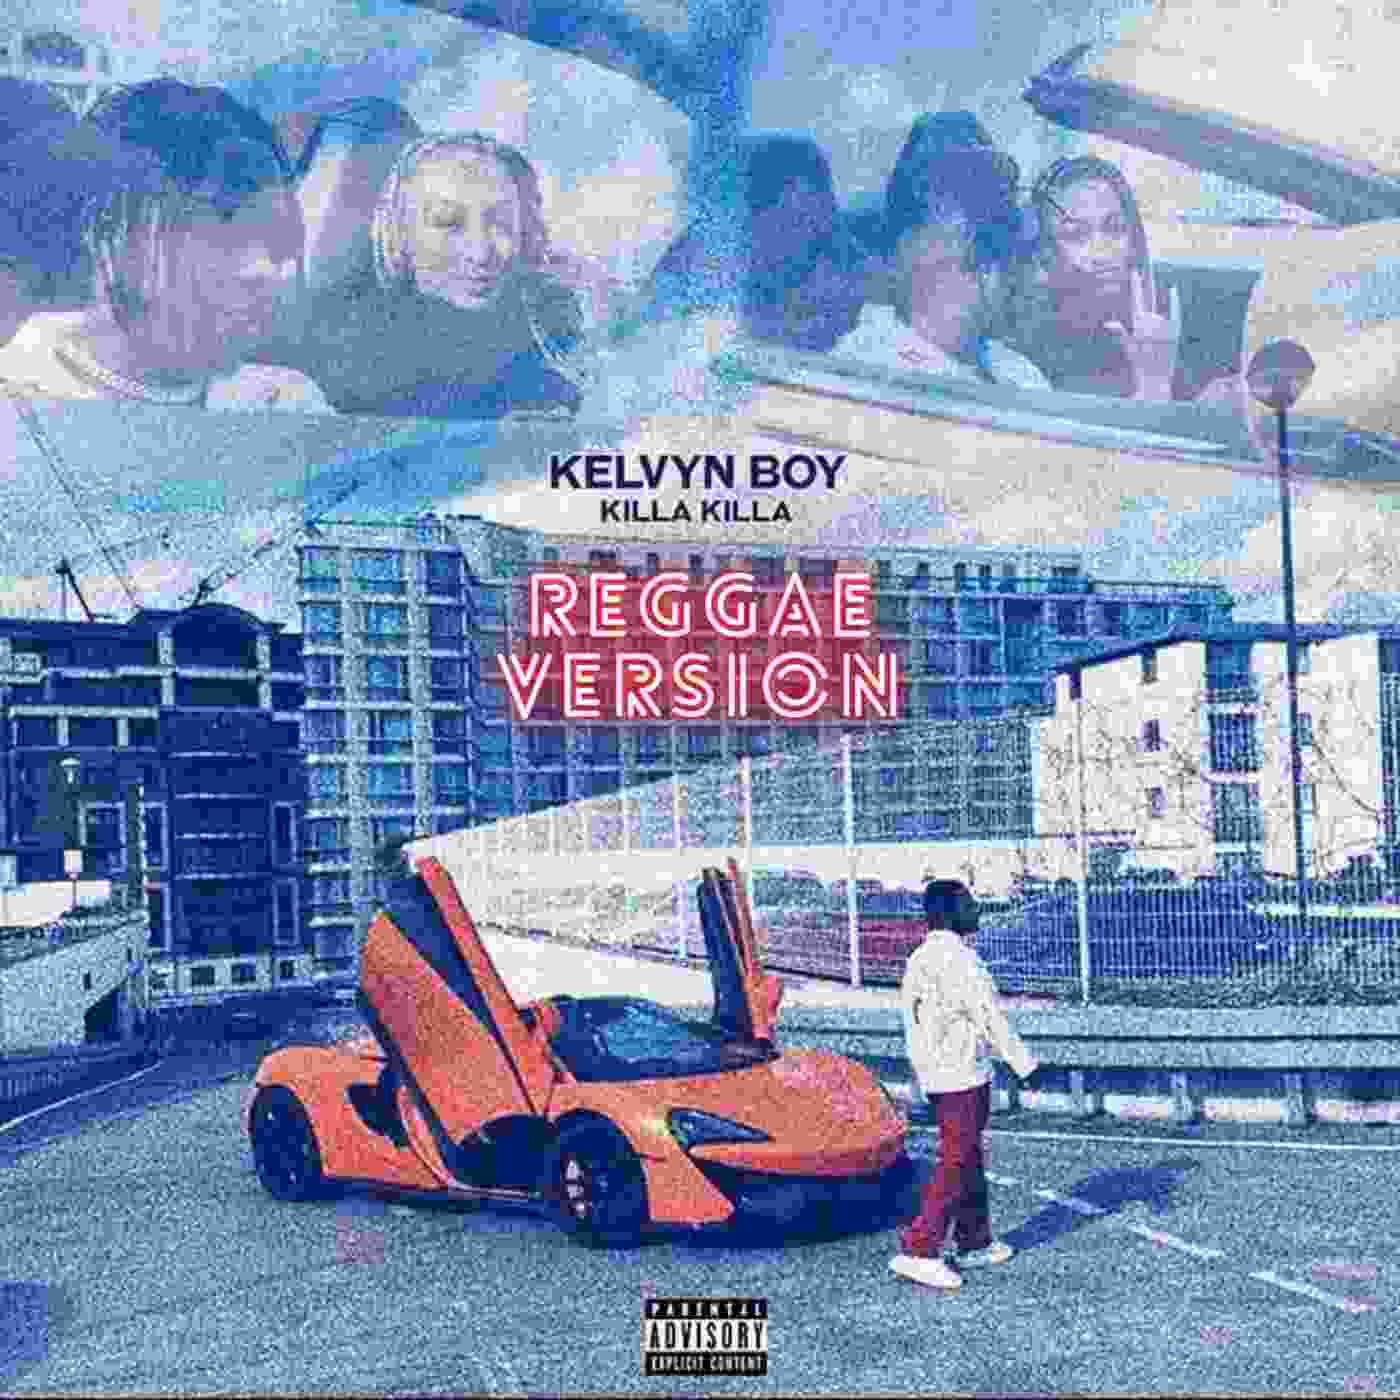 Kelvyn Boy – Killa Killa (Reggae Version)